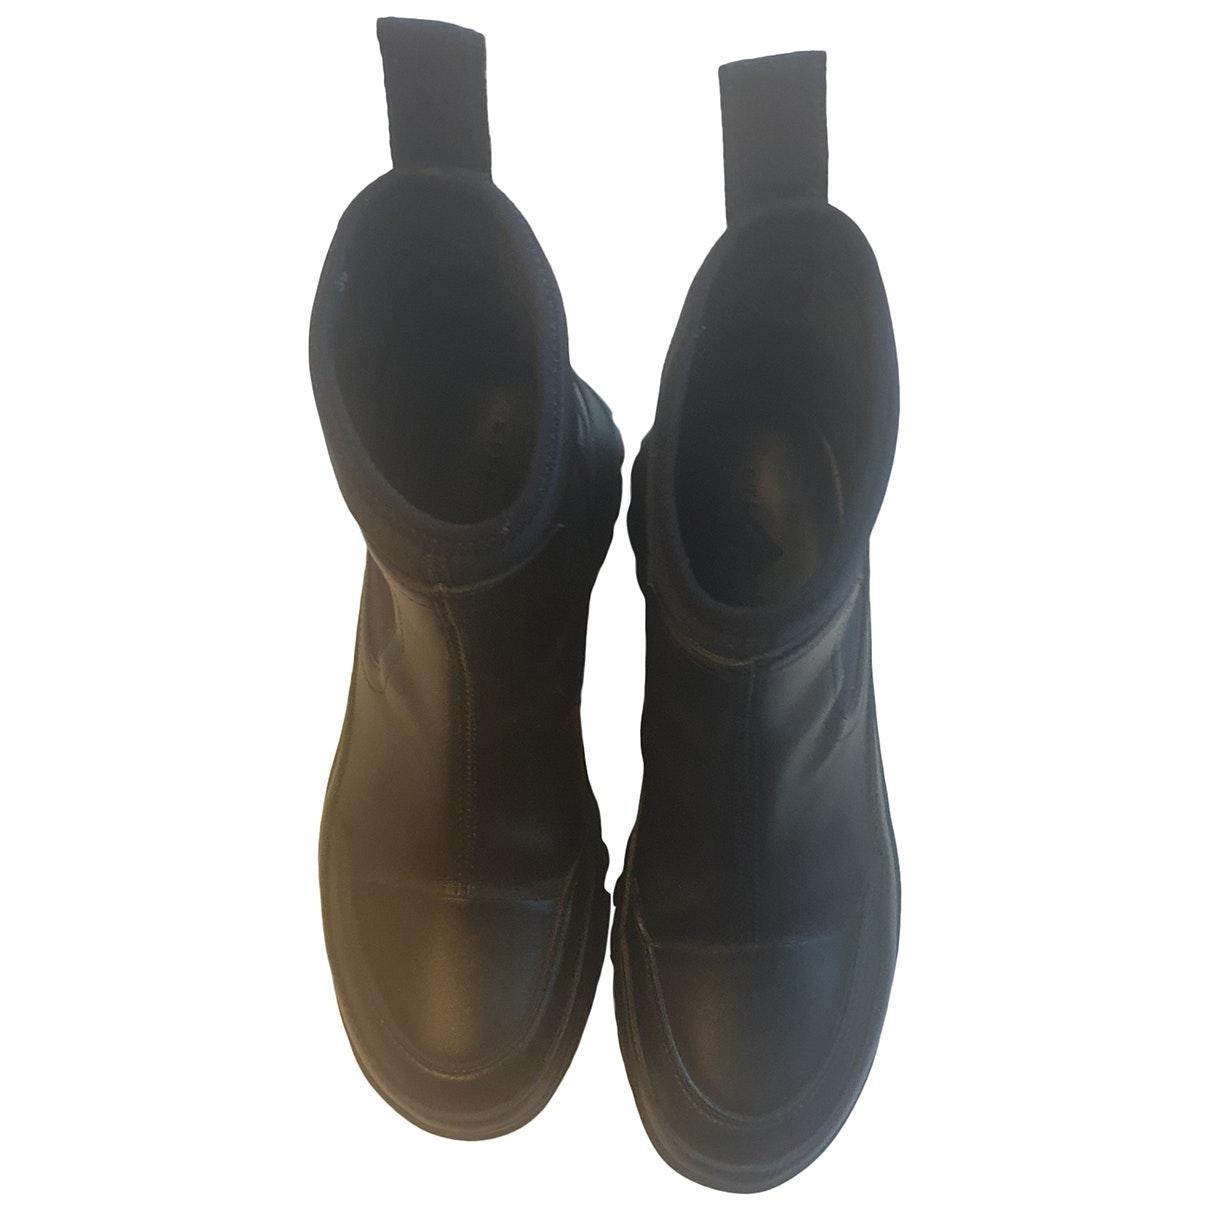 Boots en Polyester Noir Stella McCartney en coloris Noir